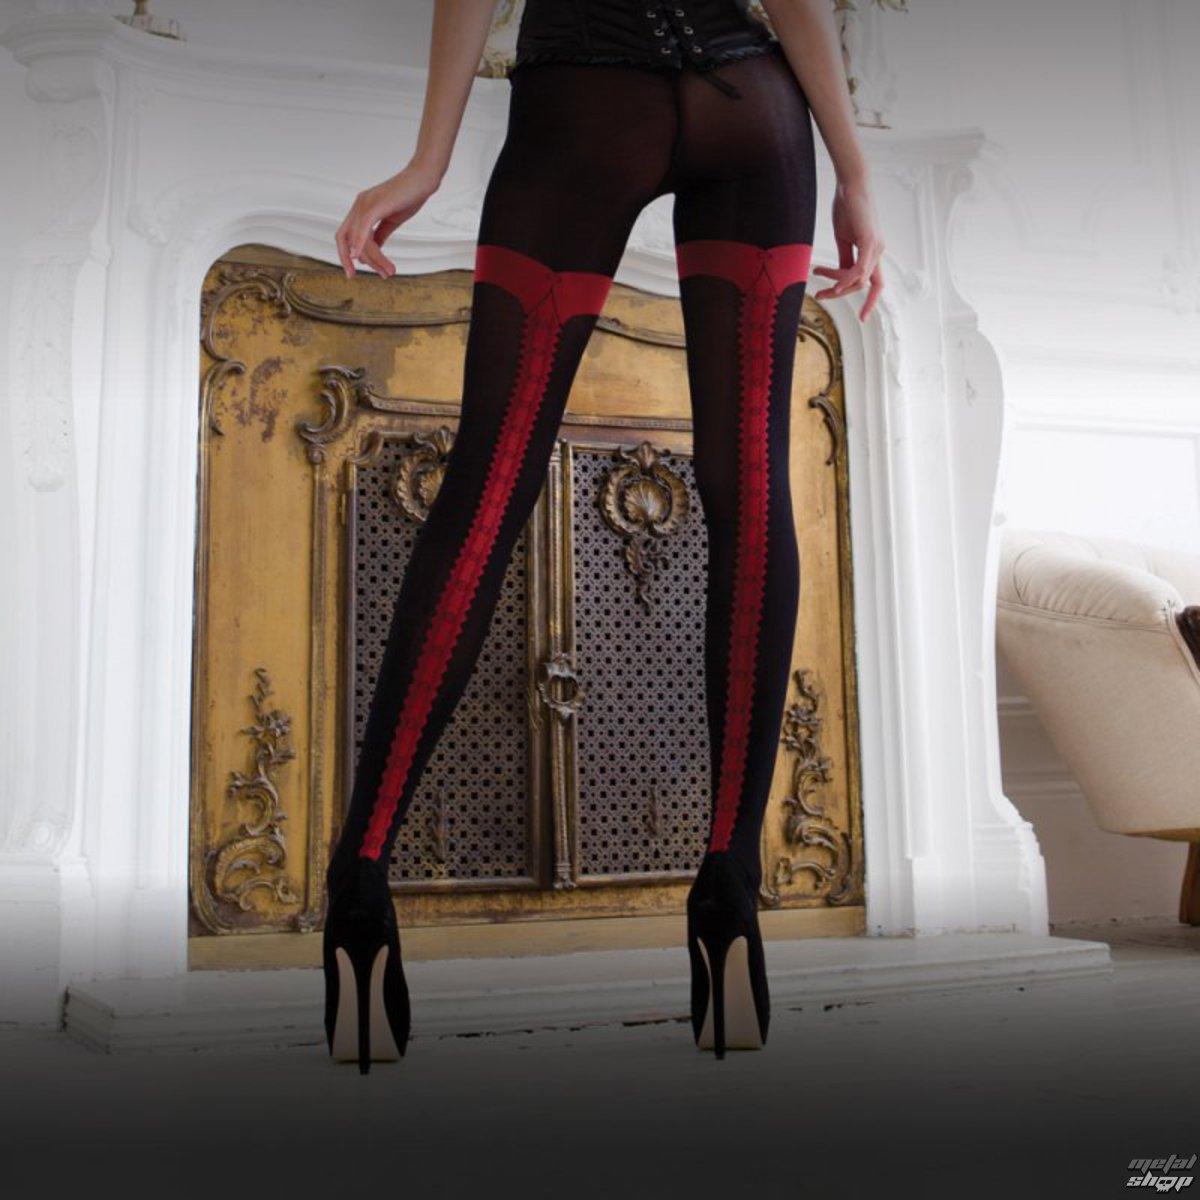 pančucháče LEGWEAR - charley opaque - black with red seam - OHVCTG2BL1